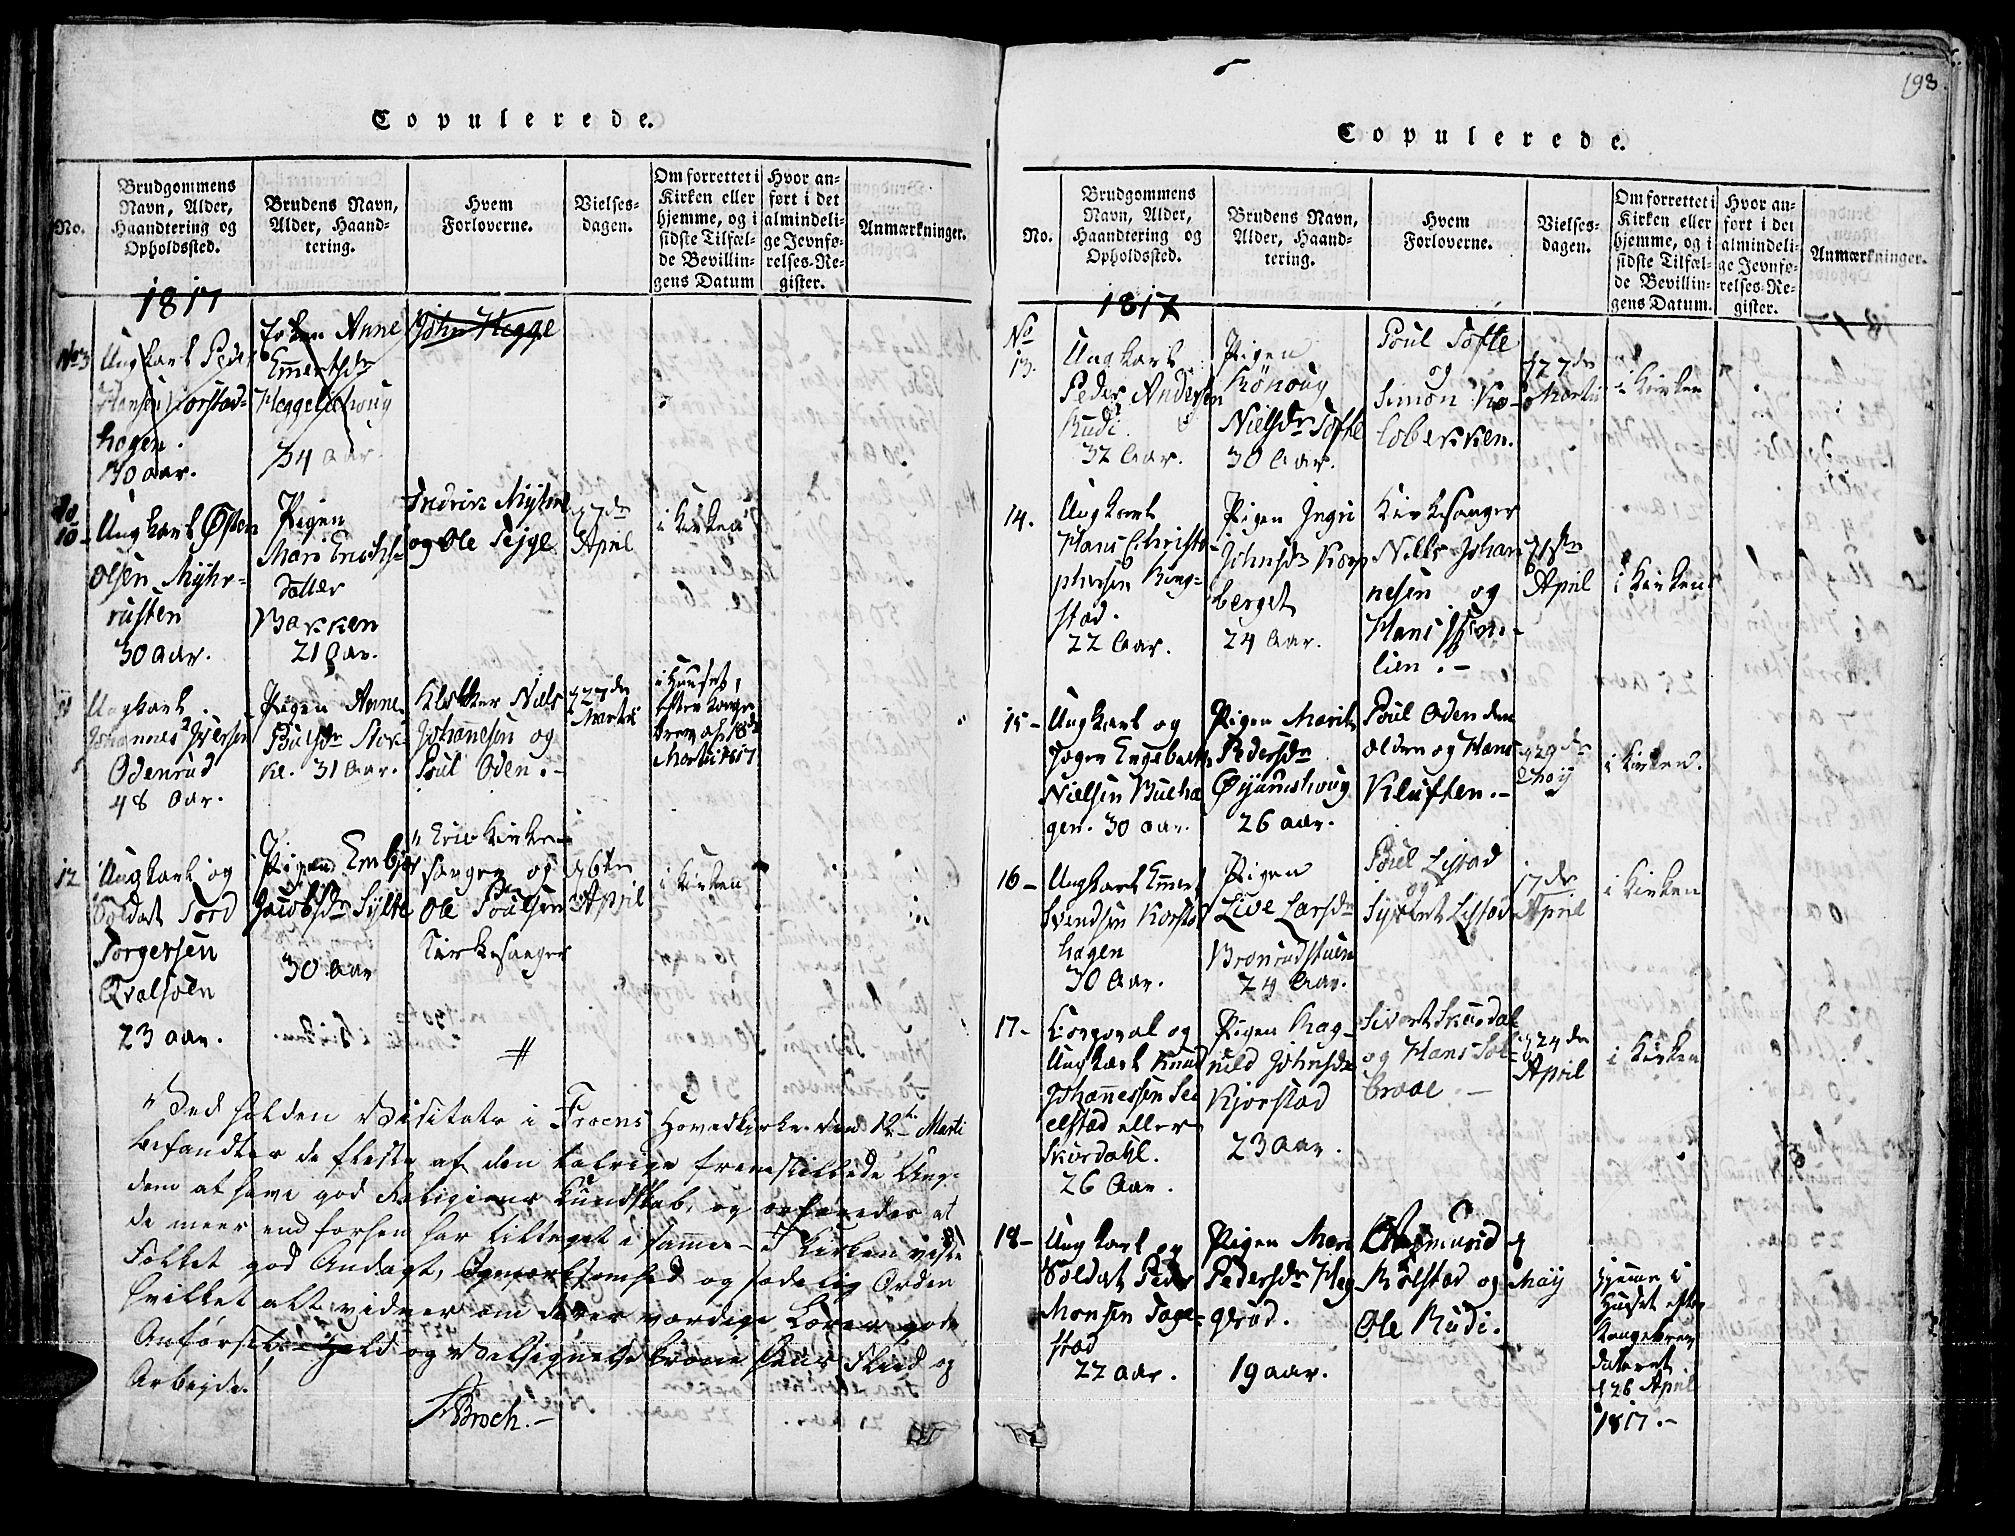 SAH, Fron prestekontor, H/Ha/Haa/L0002: Ministerialbok nr. 2, 1816-1827, s. 198